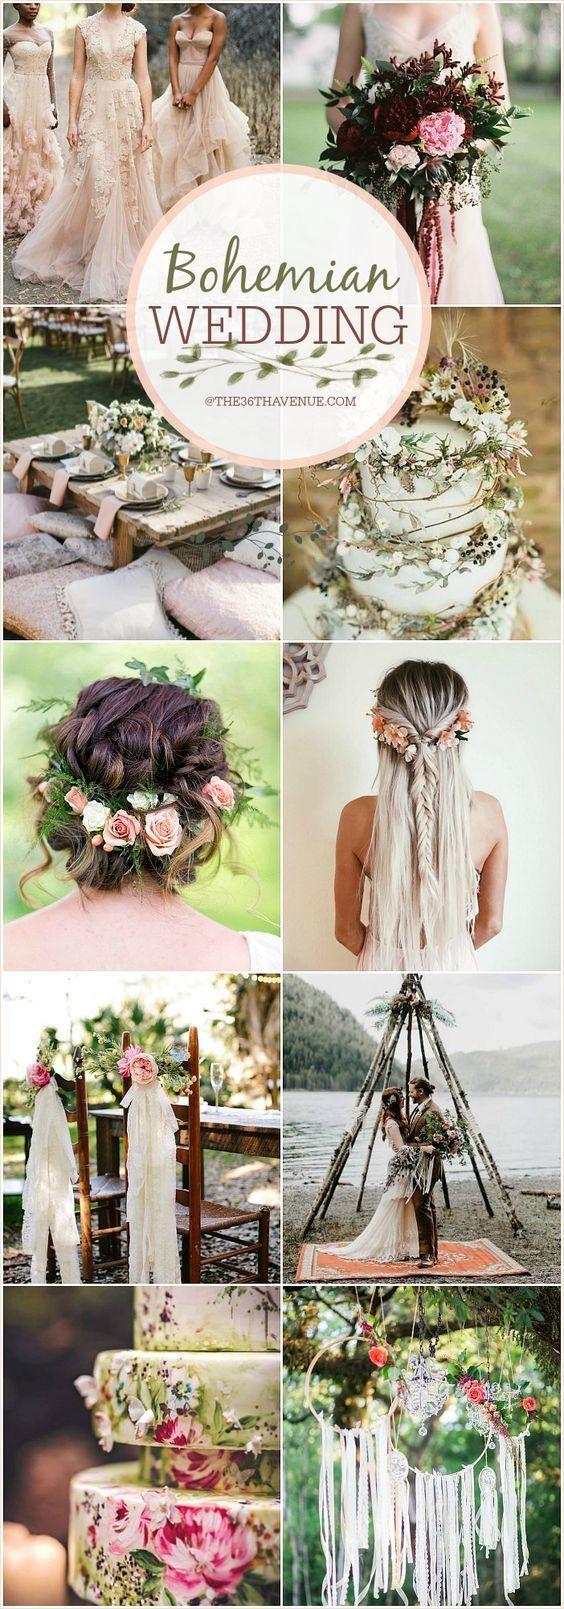 Bohemian wedding ideas diy boho chic wedding mine pinterest